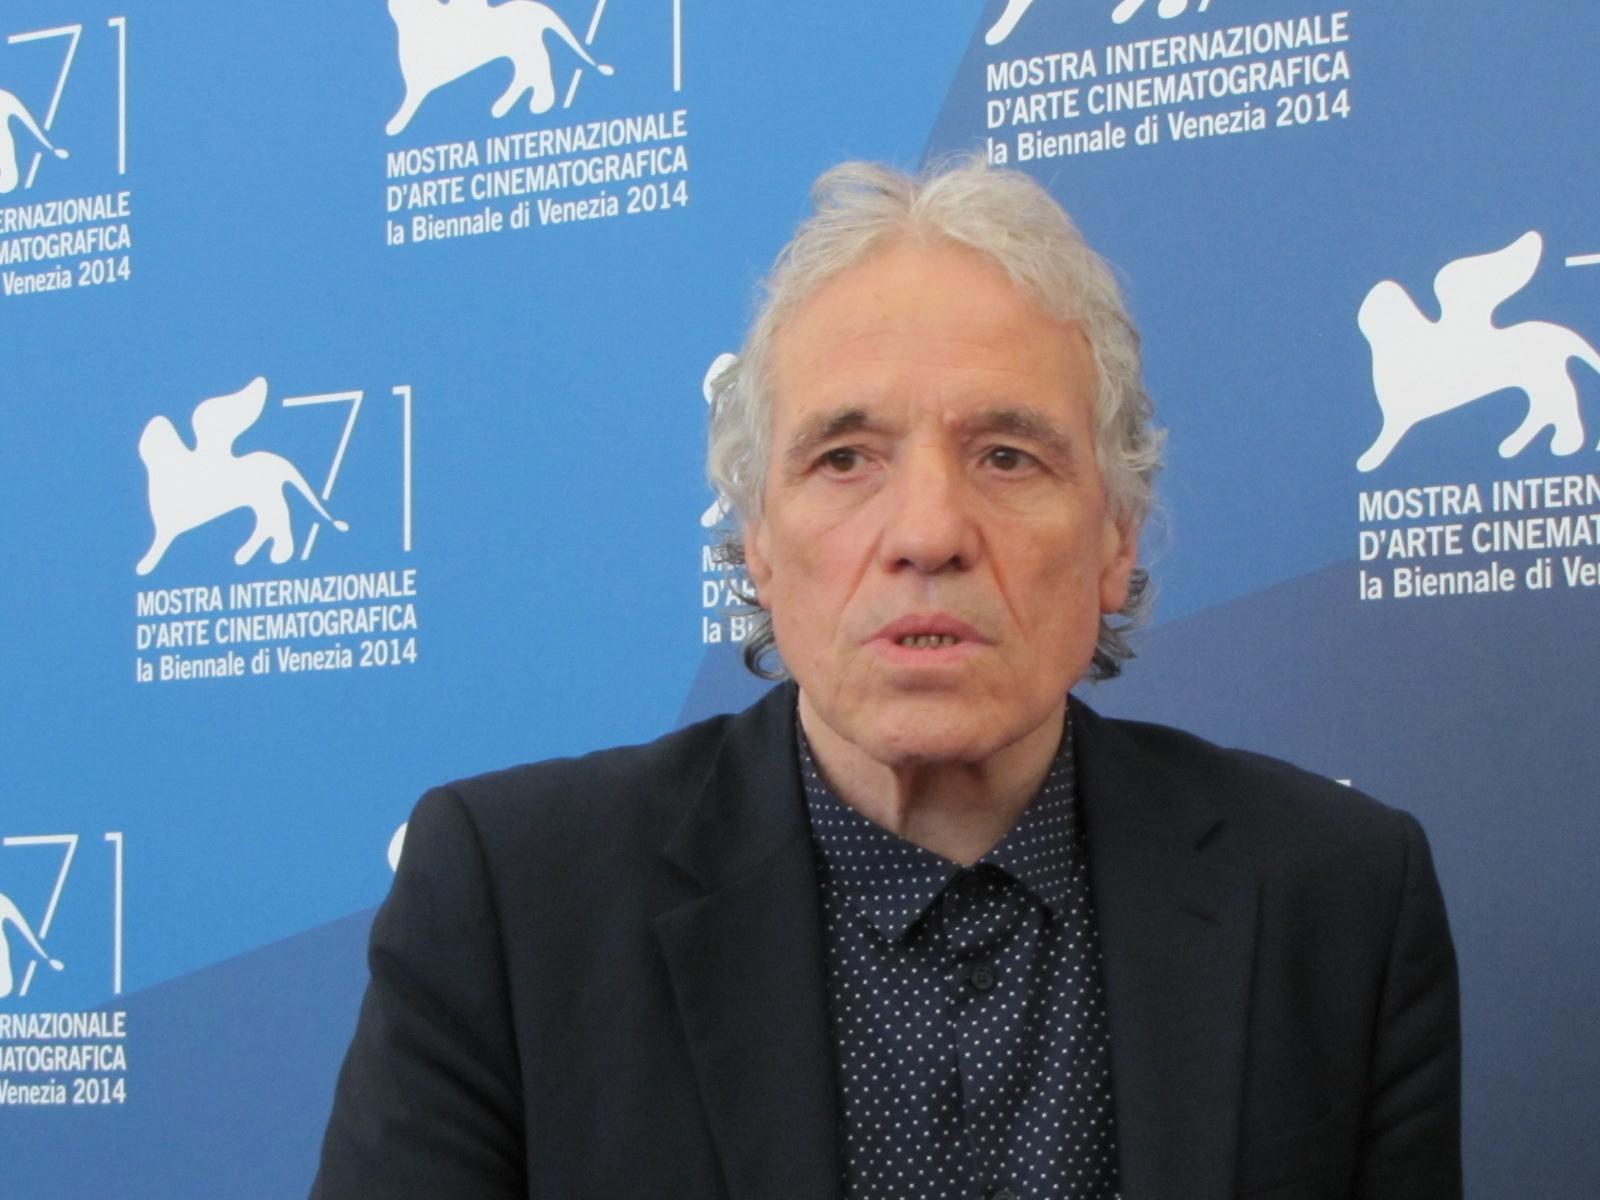 'Pasolini' a Venezia 2014 - Ferrara presenta la pellicola